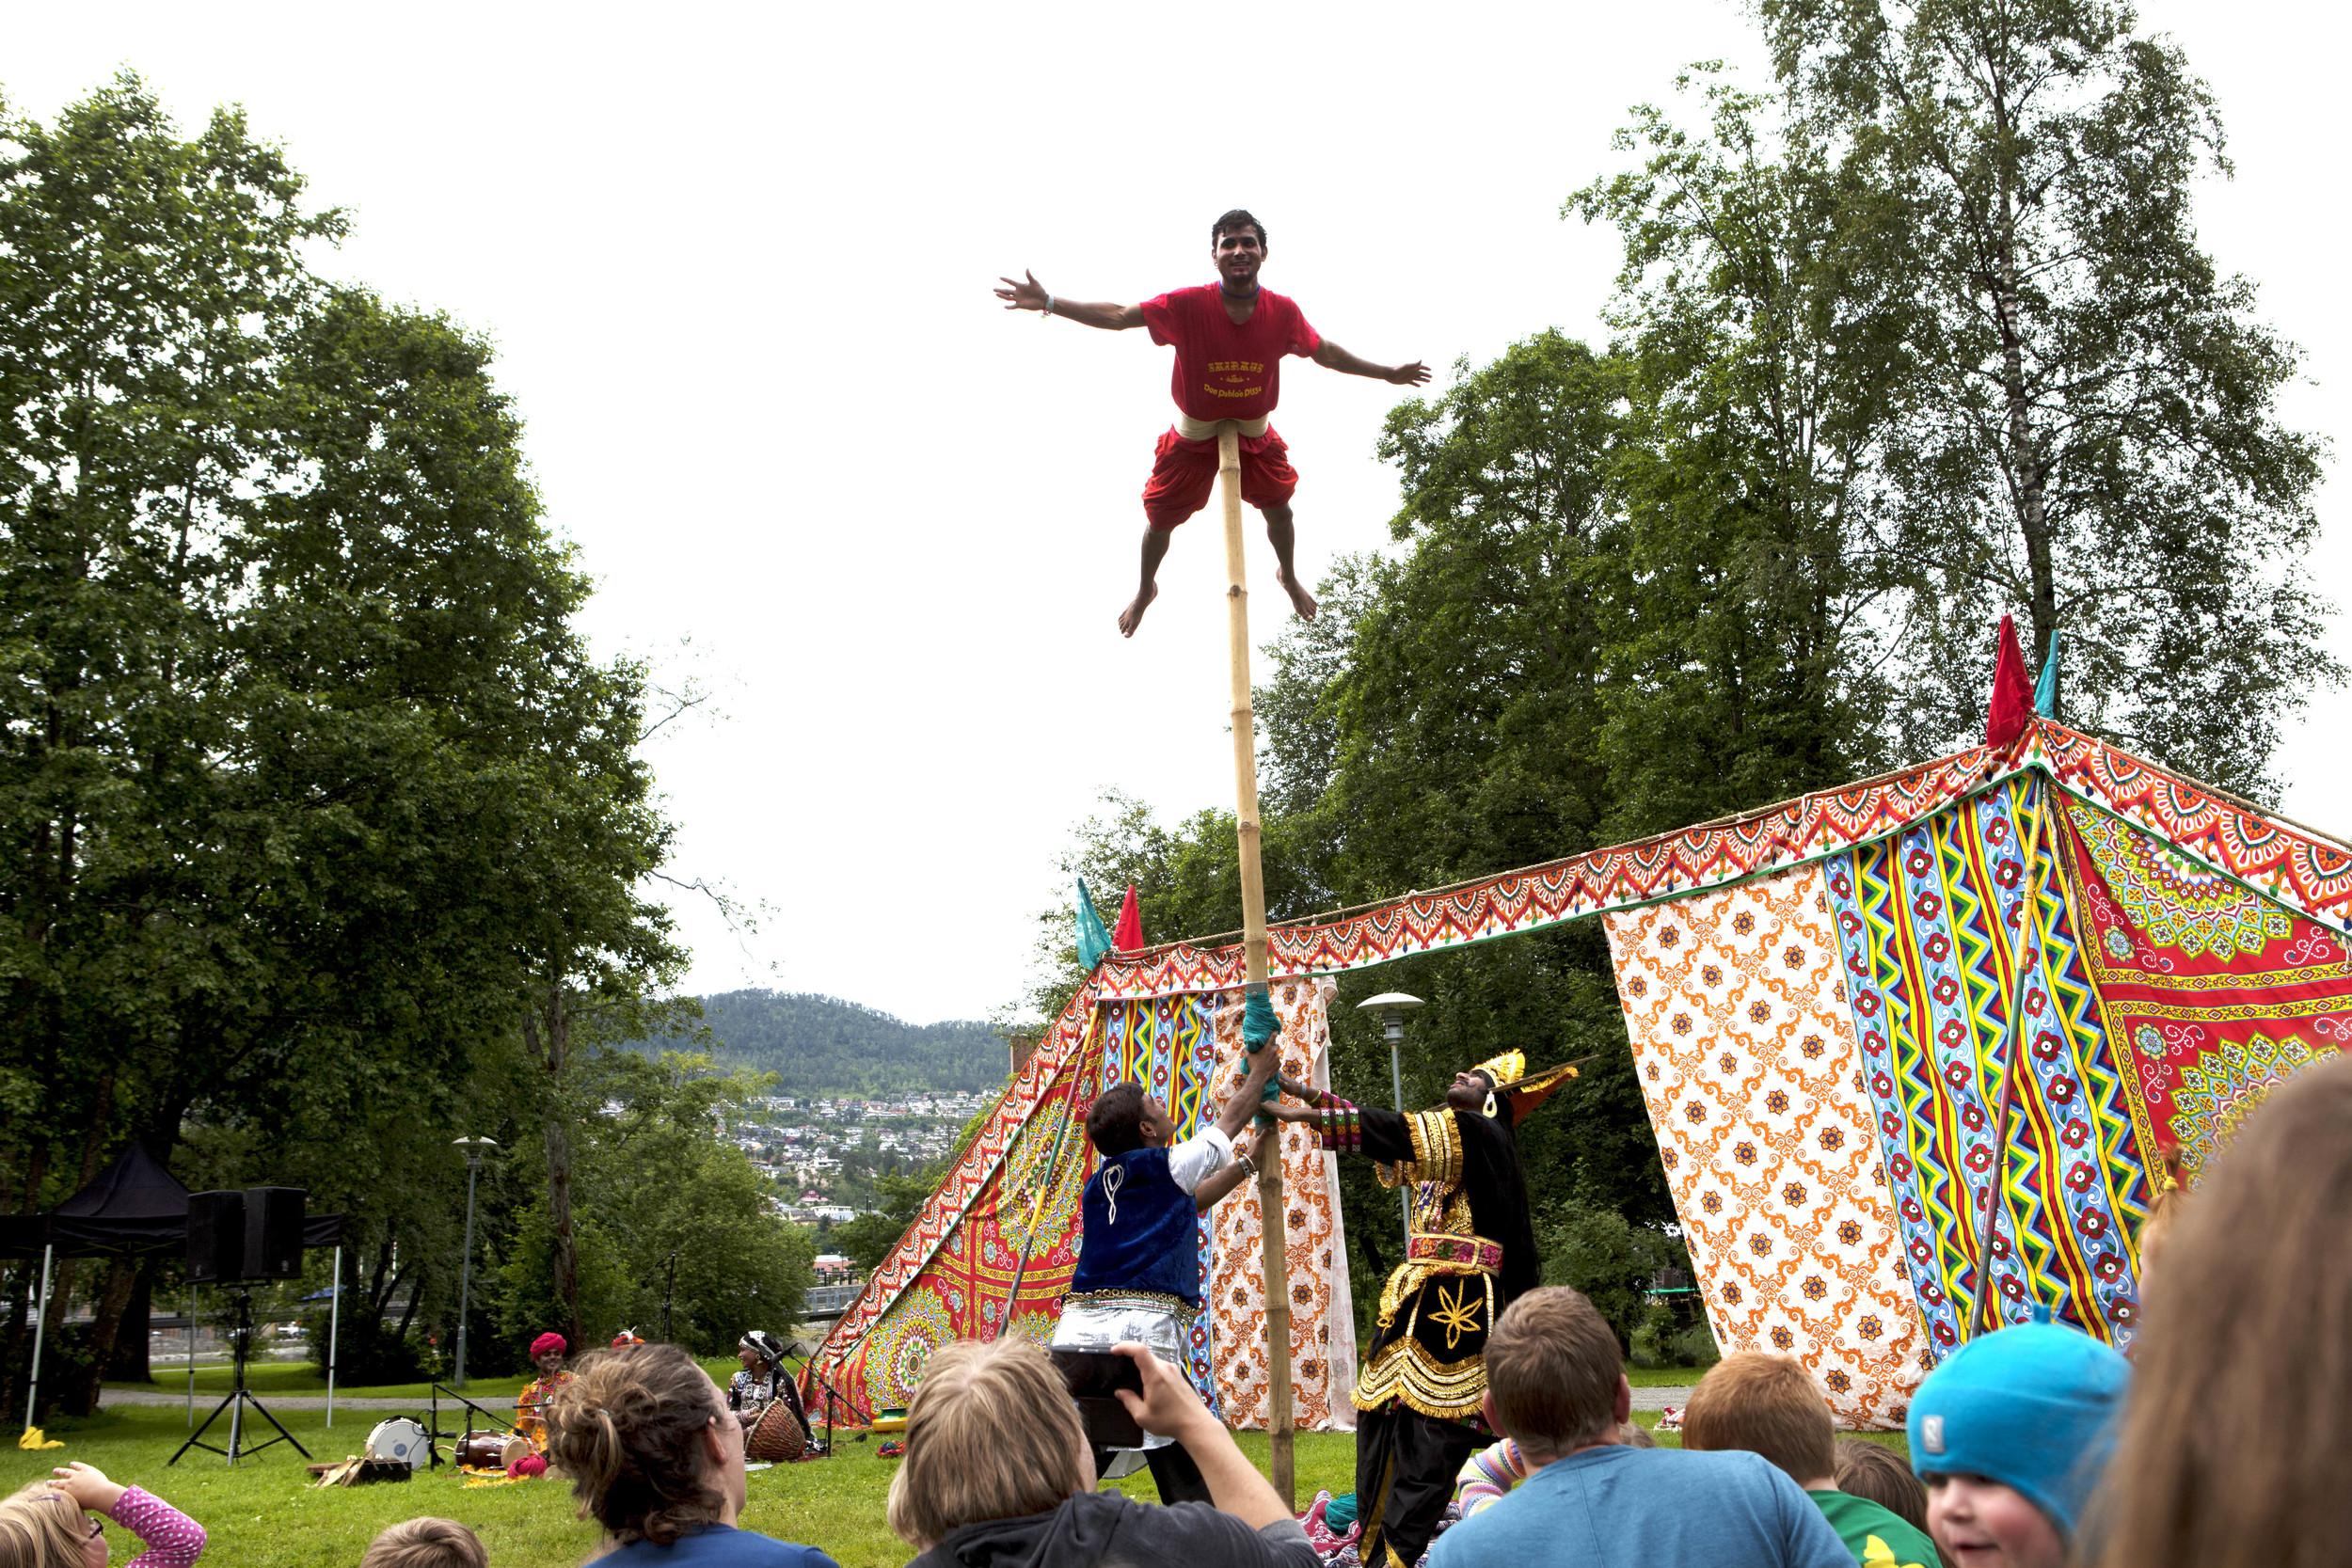 circus raj_fredag_heidihattestein_2.jpg